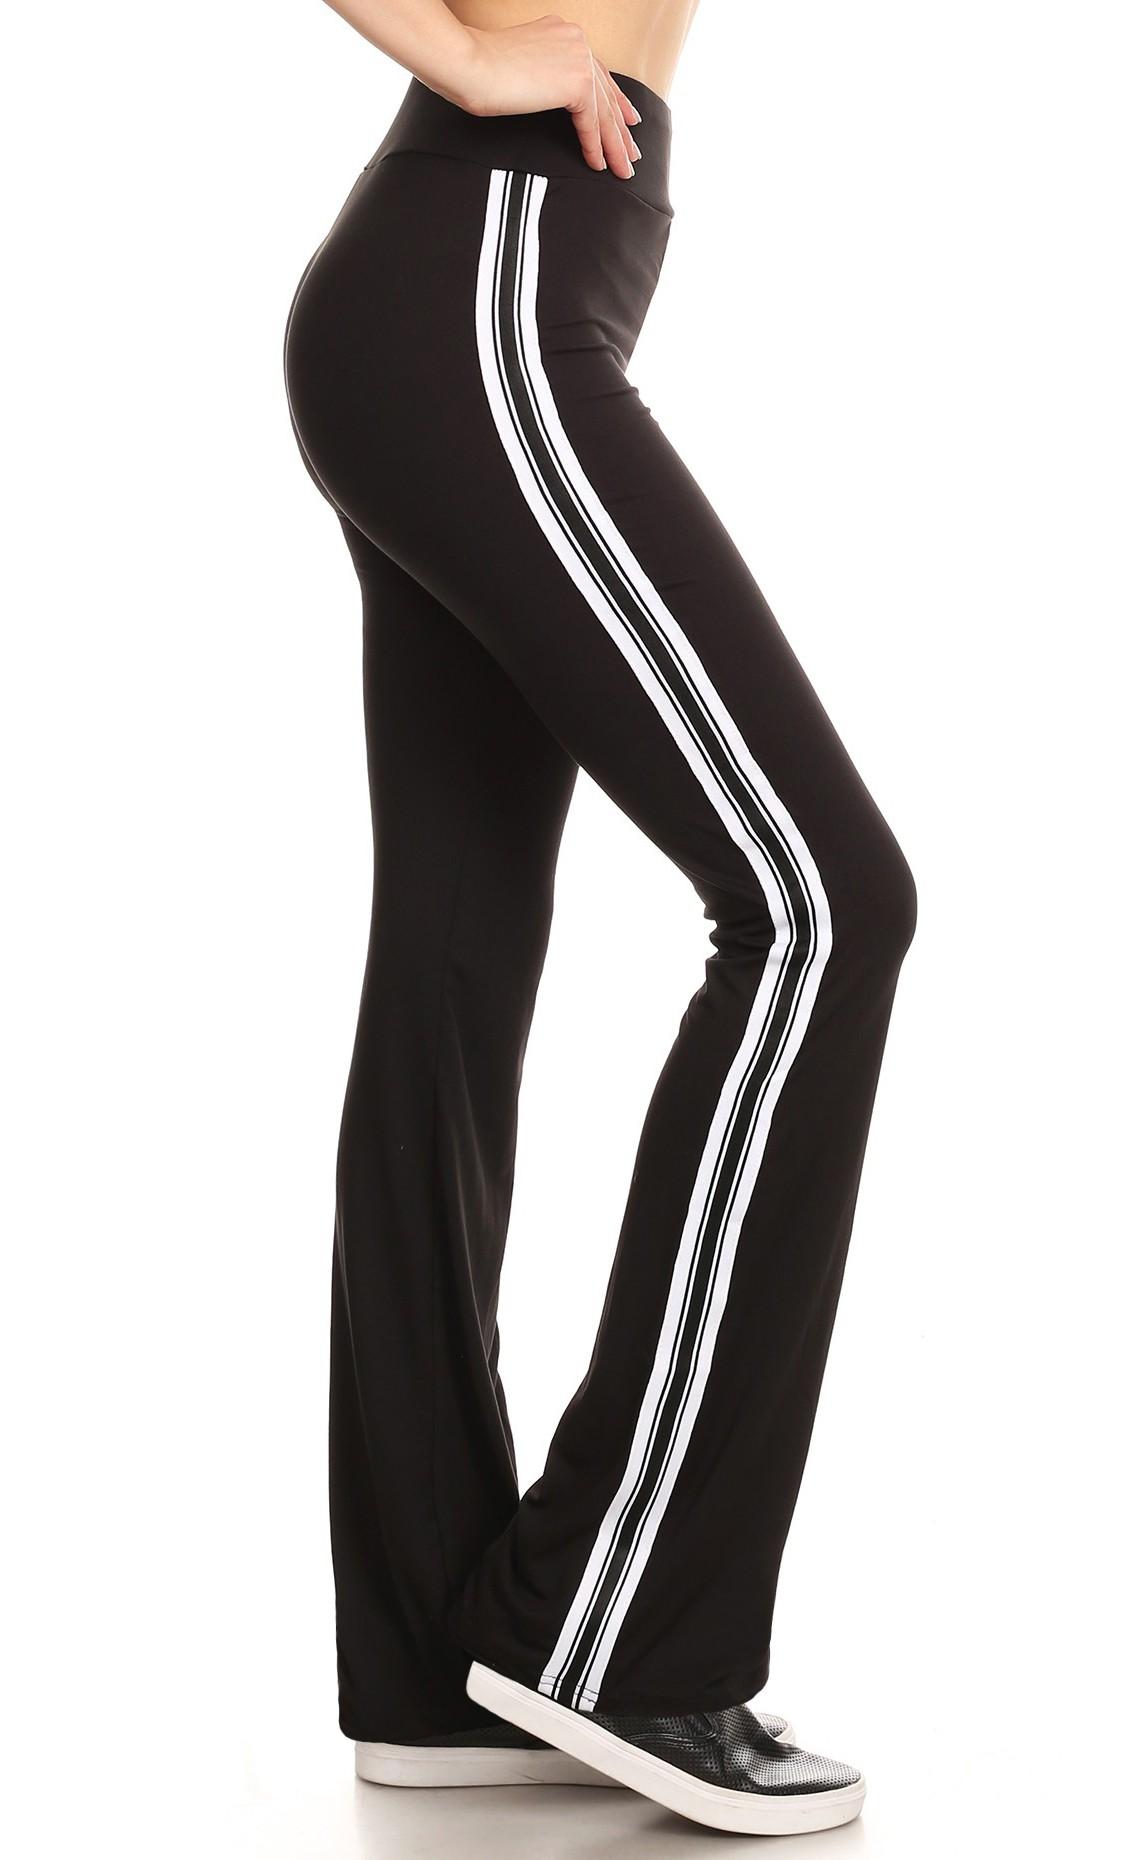 BLACK FLARE PANTS W/ SIDE WHITE/BLACK TAPING#8FP07-03